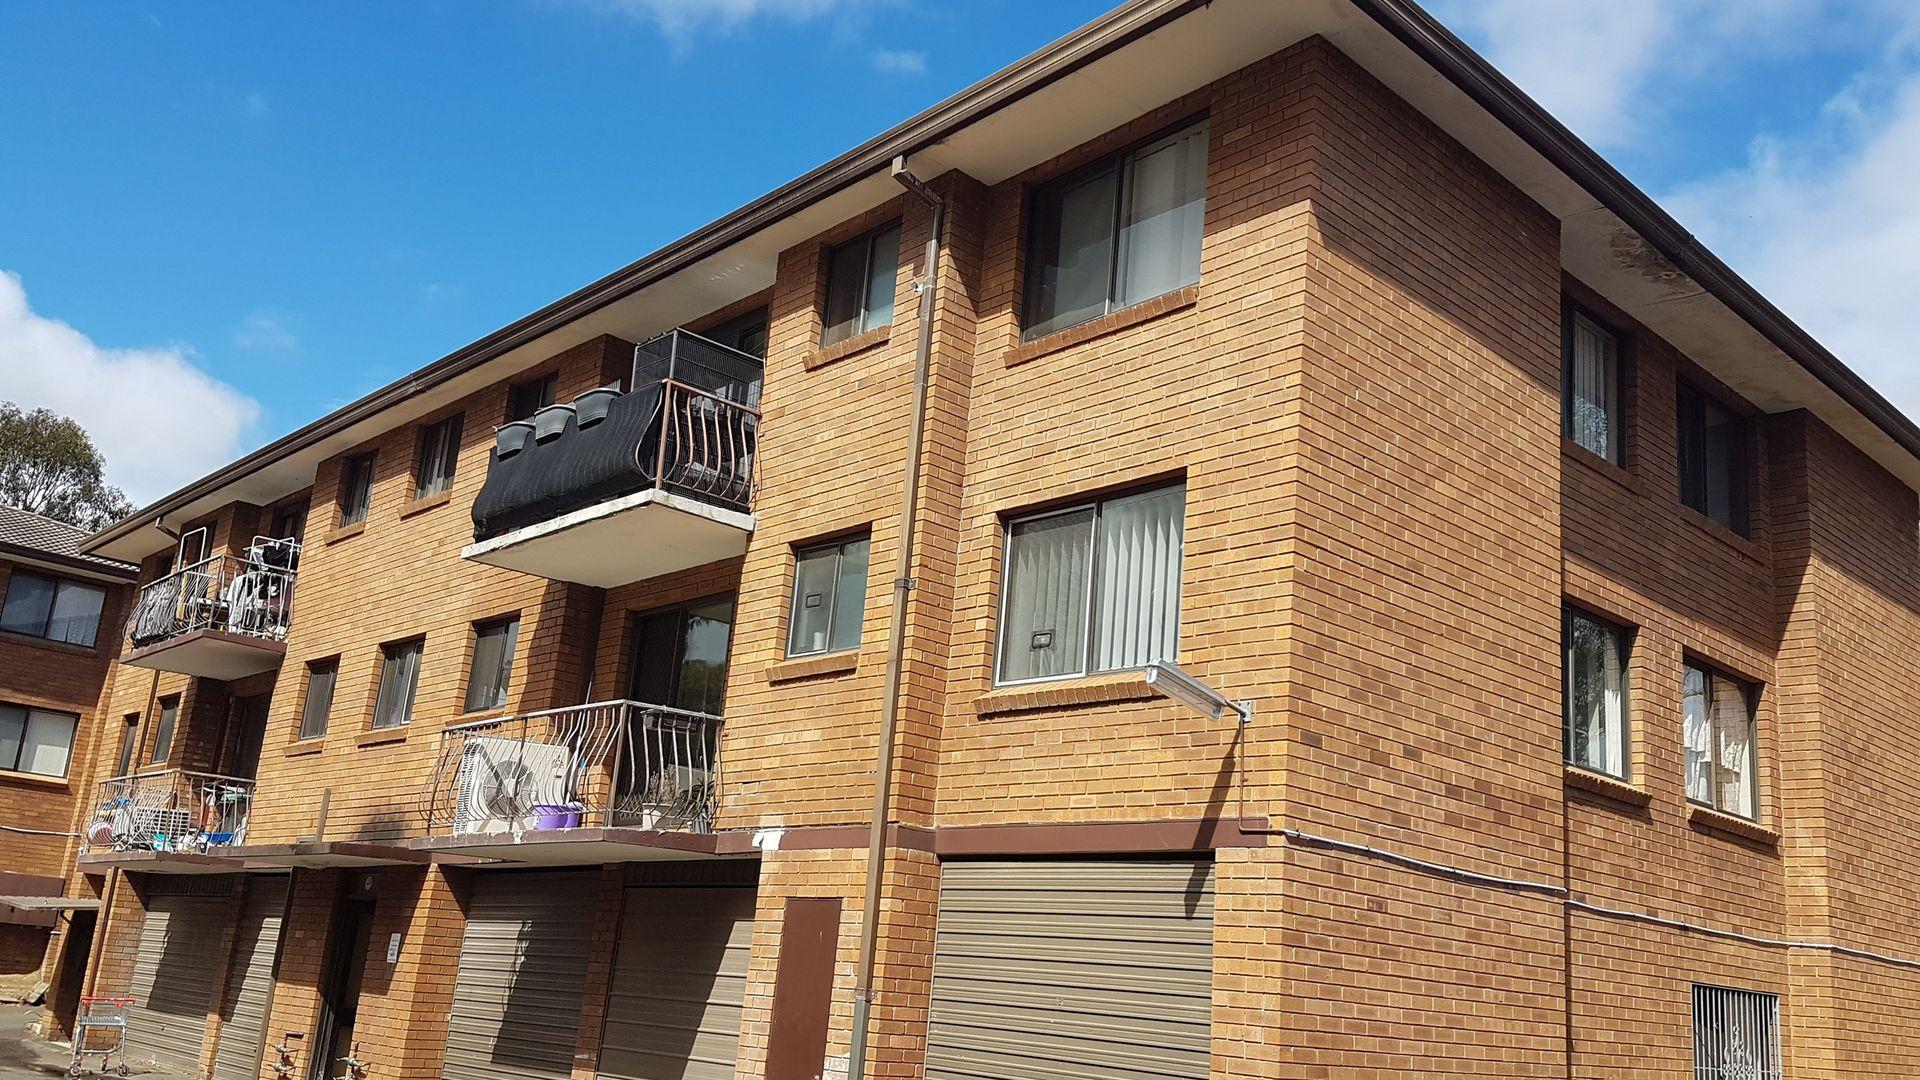 14/38 LUXFORD ROAD, Mount Druitt NSW 2770, Image 1